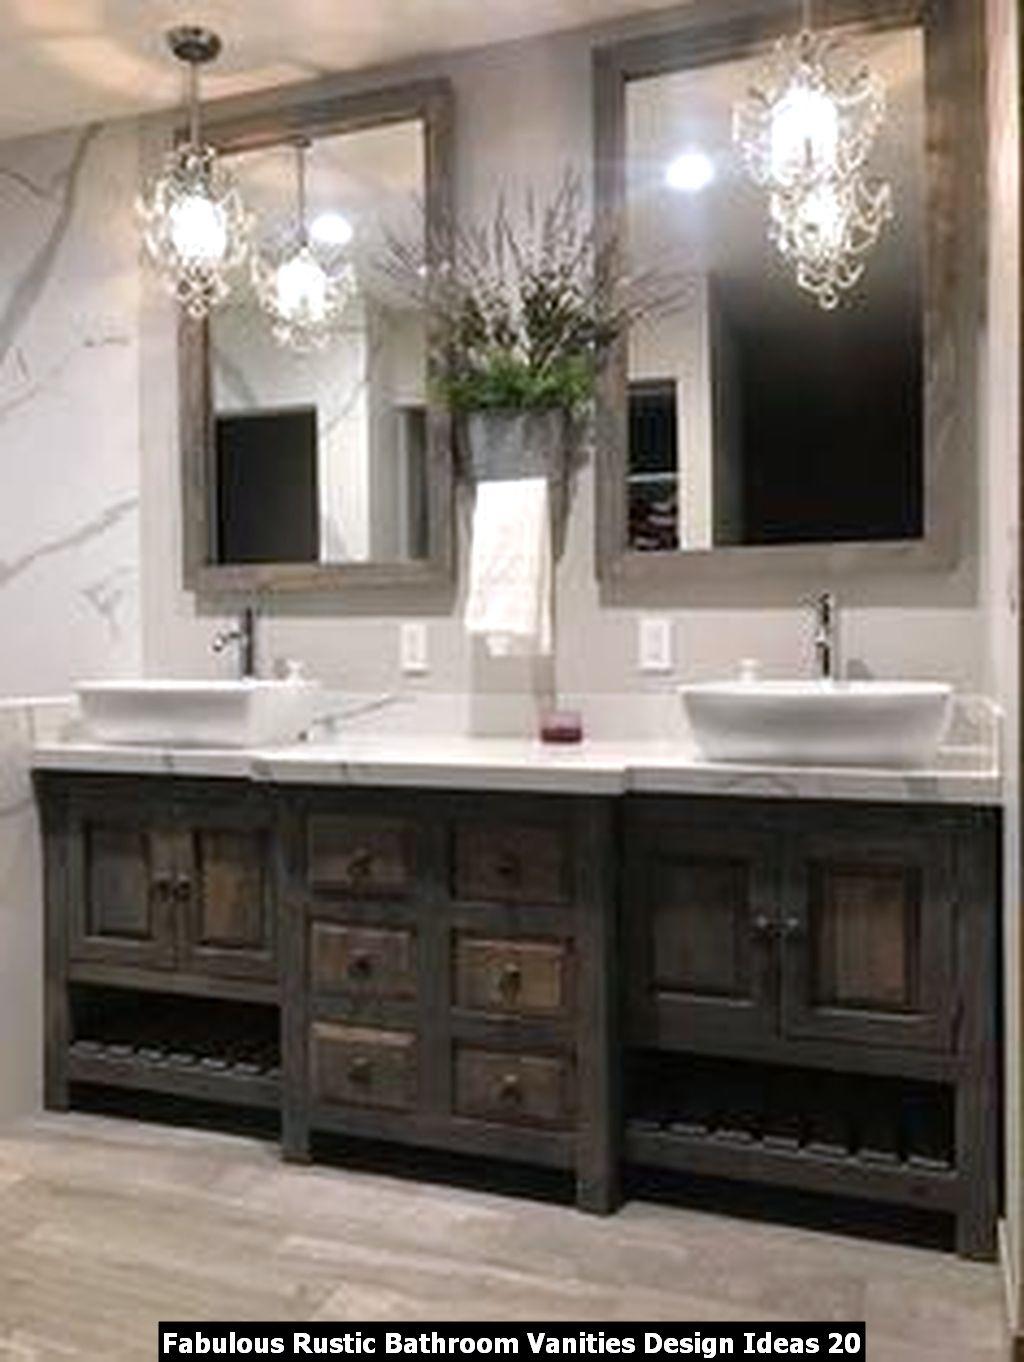 Fabulous Rustic Bathroom Vanities Design Ideas 20